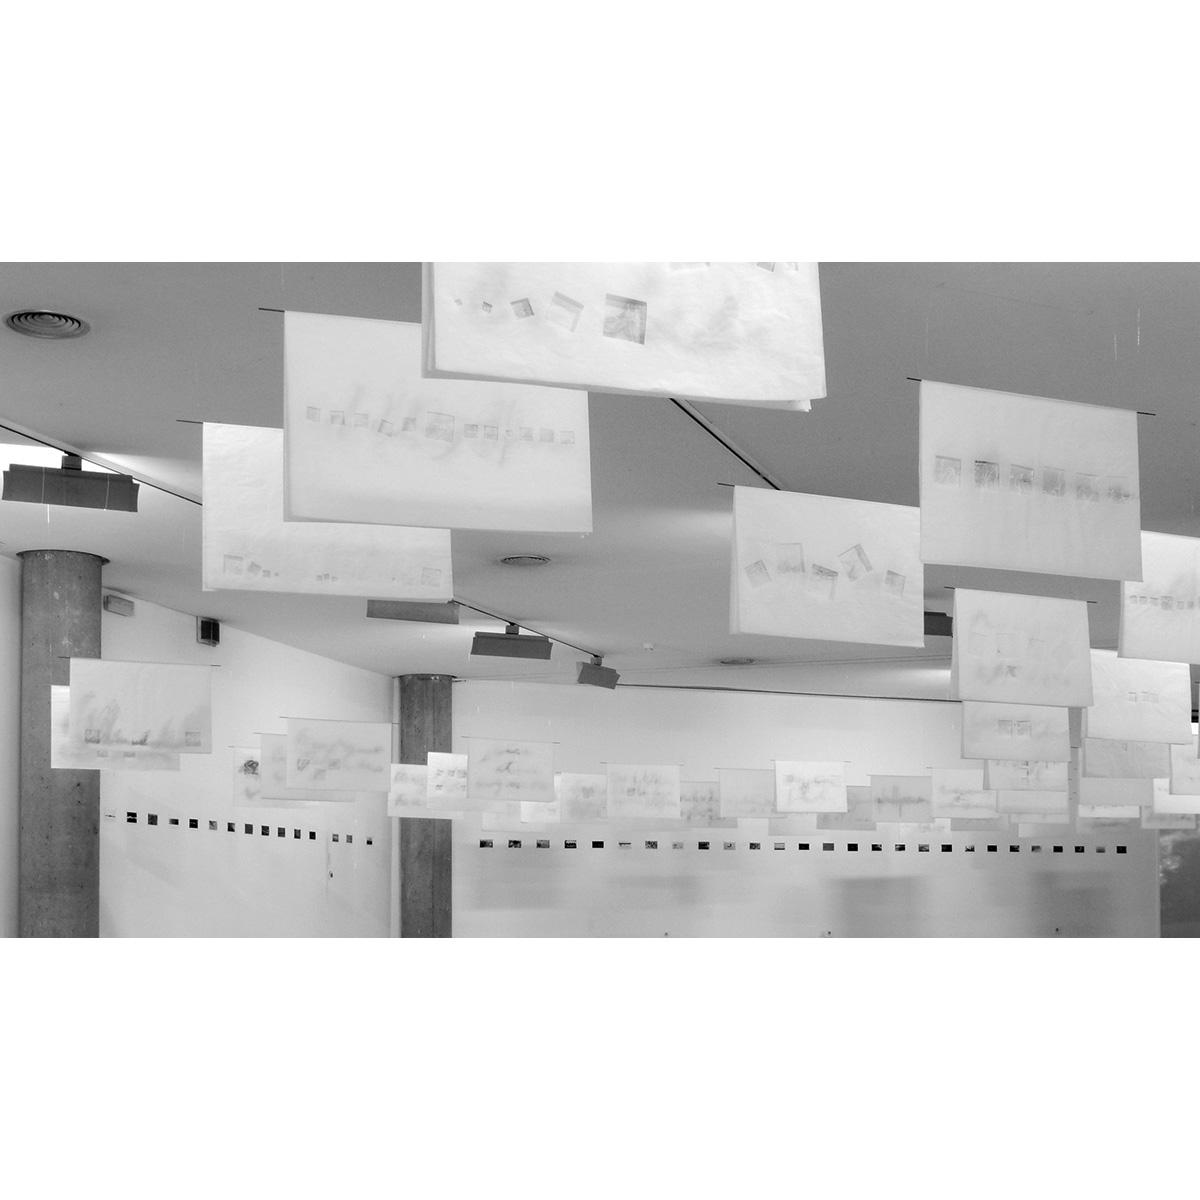 LEANDRO ALONSO - Caligrafias Extrañas